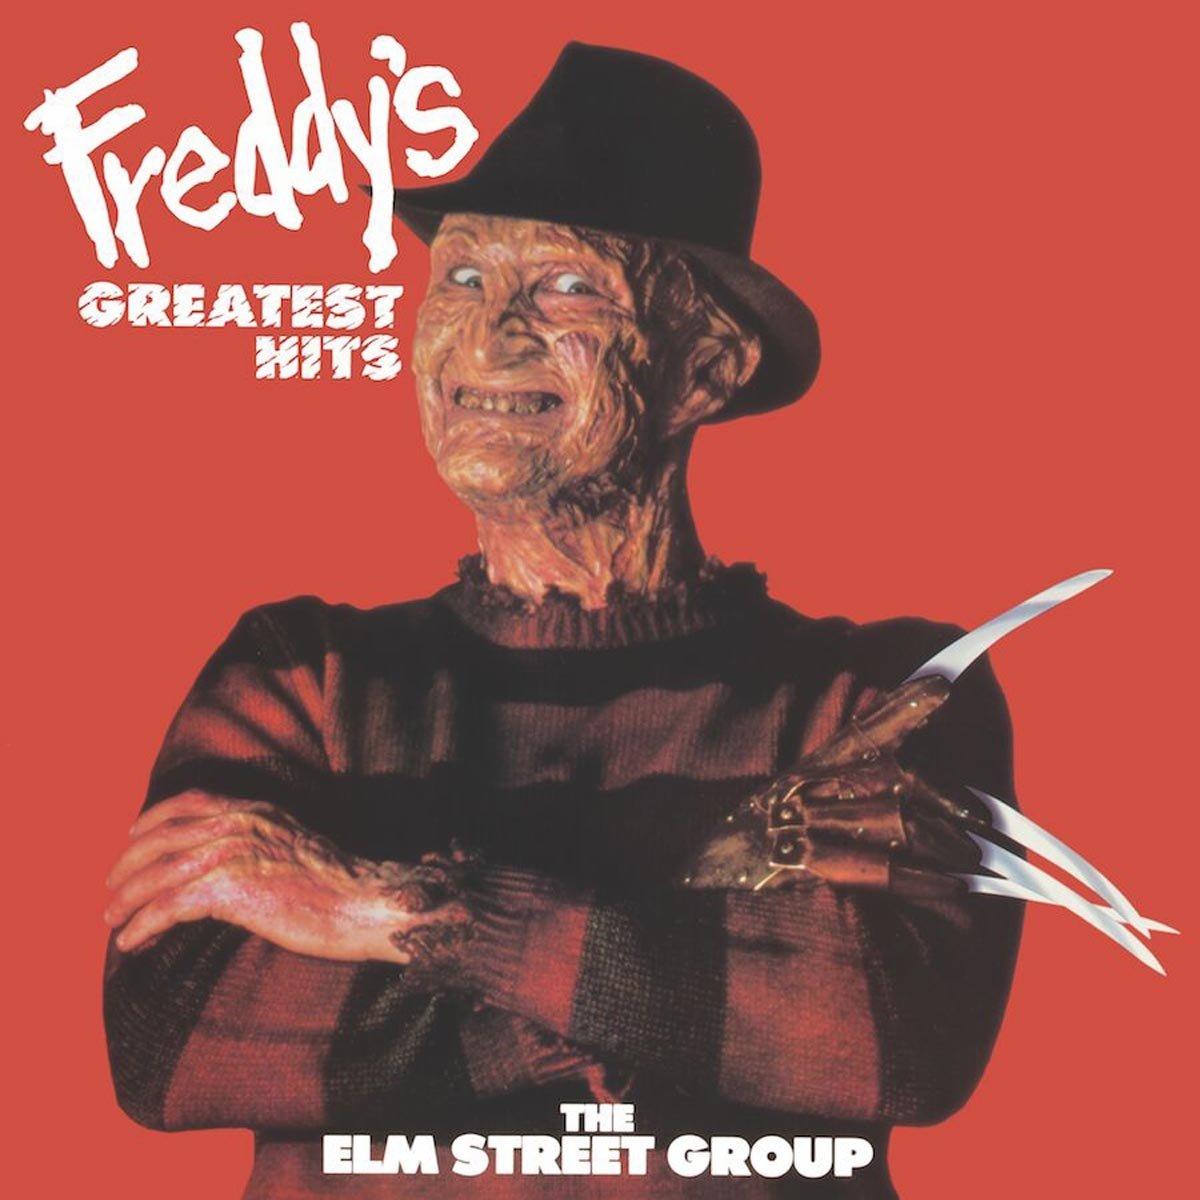 Vinilo : ELM STREET GROUP (FT ROBERT ENGLUND) - Freddy's Greatest Hits (LP Vinyl)